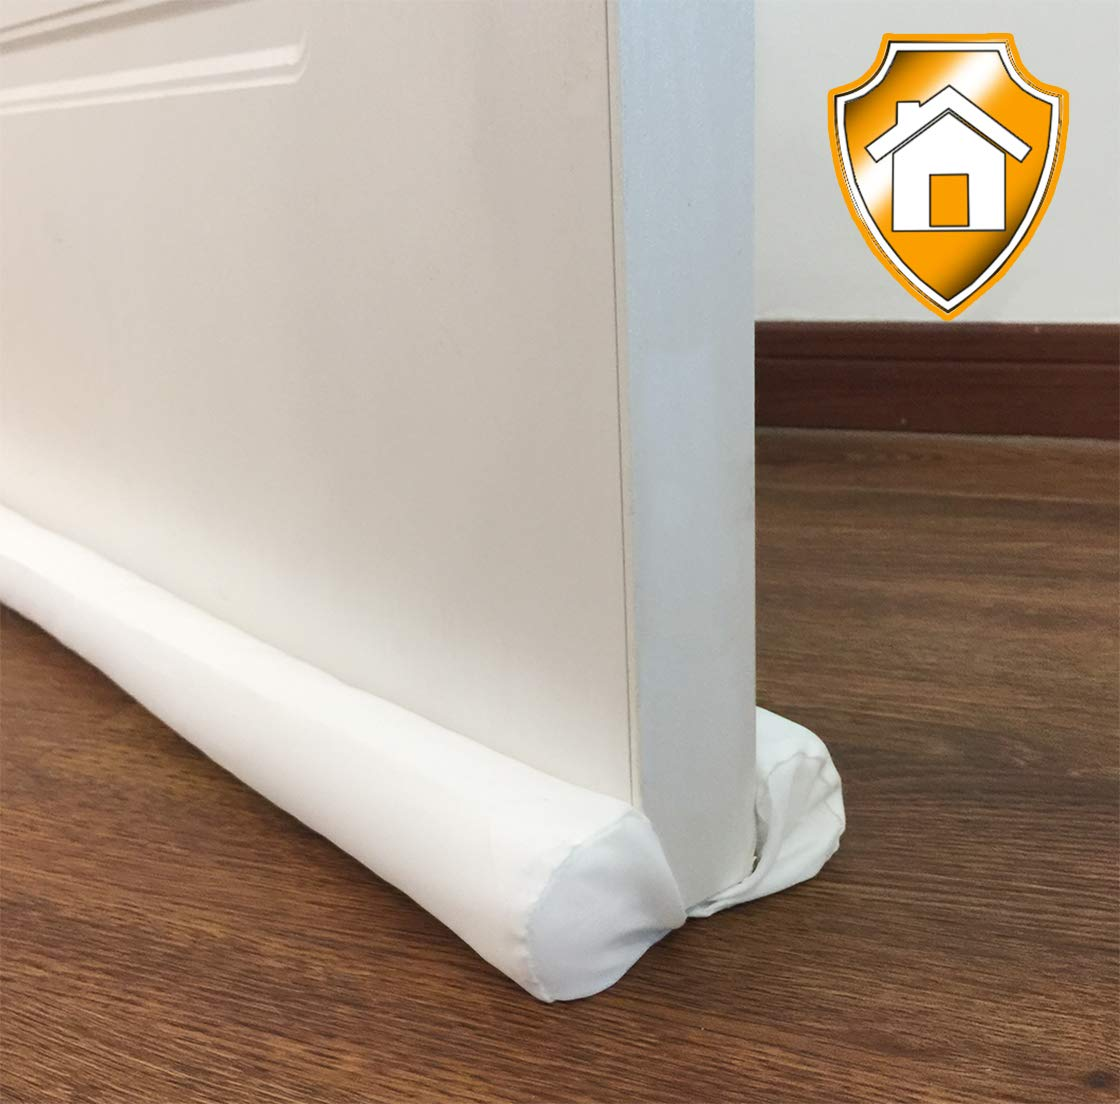 MAXTID Under Door Draft Blocker Black 32-38' Front Air Draft Stopper Reduce Cold Keep Heat in Window Breeze Blocker Adjustable